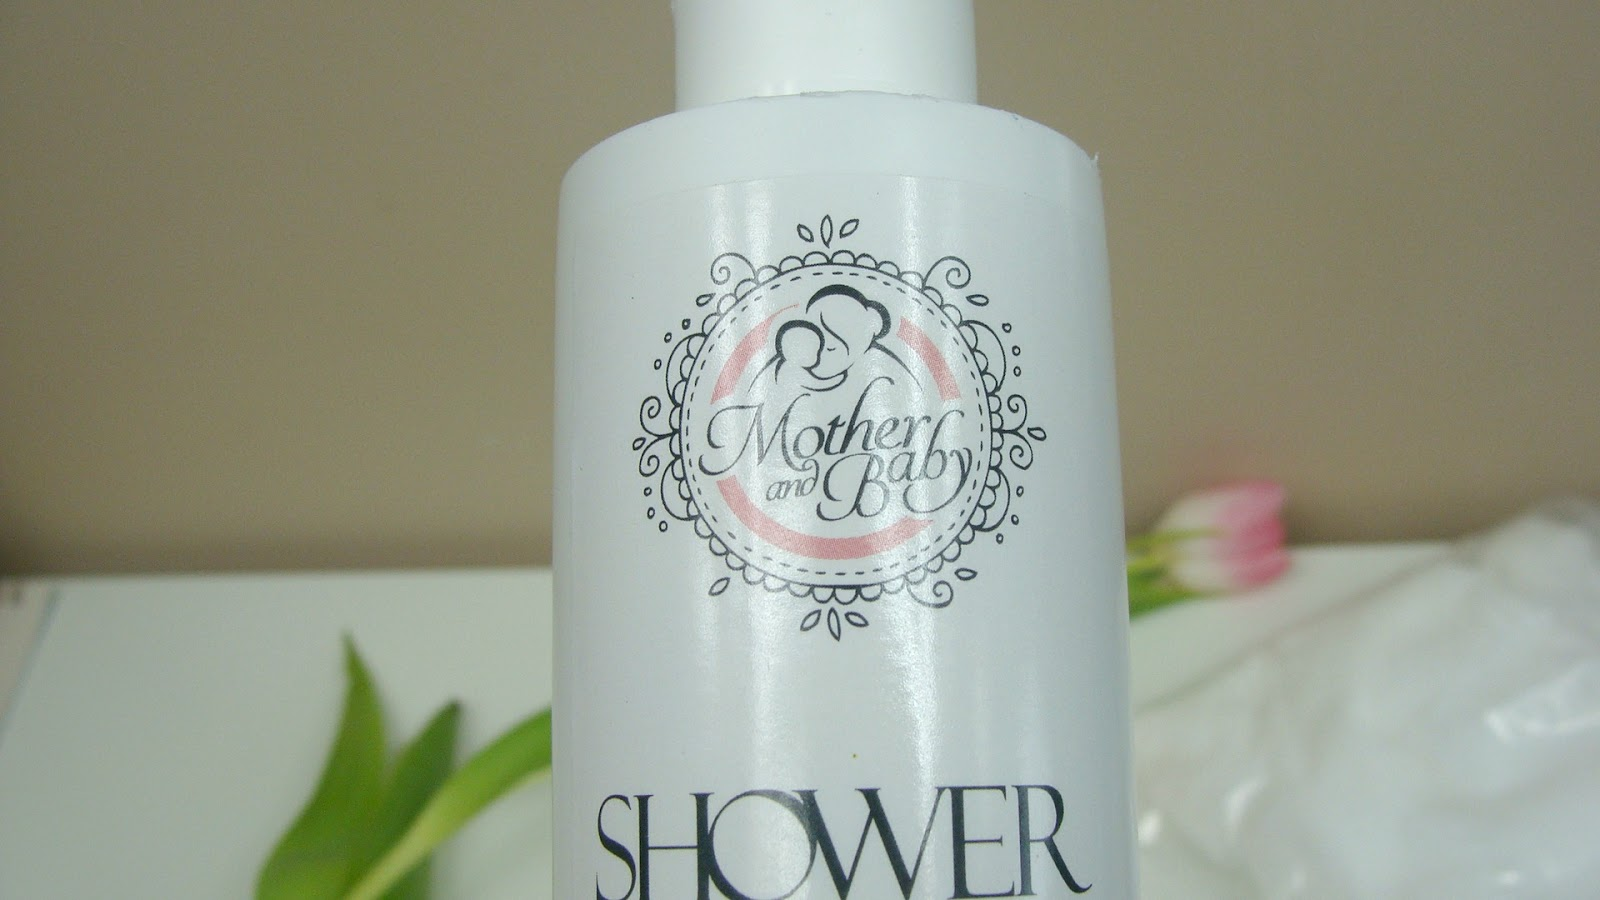 Bionigree szampon i odżywka, hristina mother and baby, kosmetyki bionigree, kosmetyki hrisina, dezodoranty pony hutchen, sól bocheńska bochneris